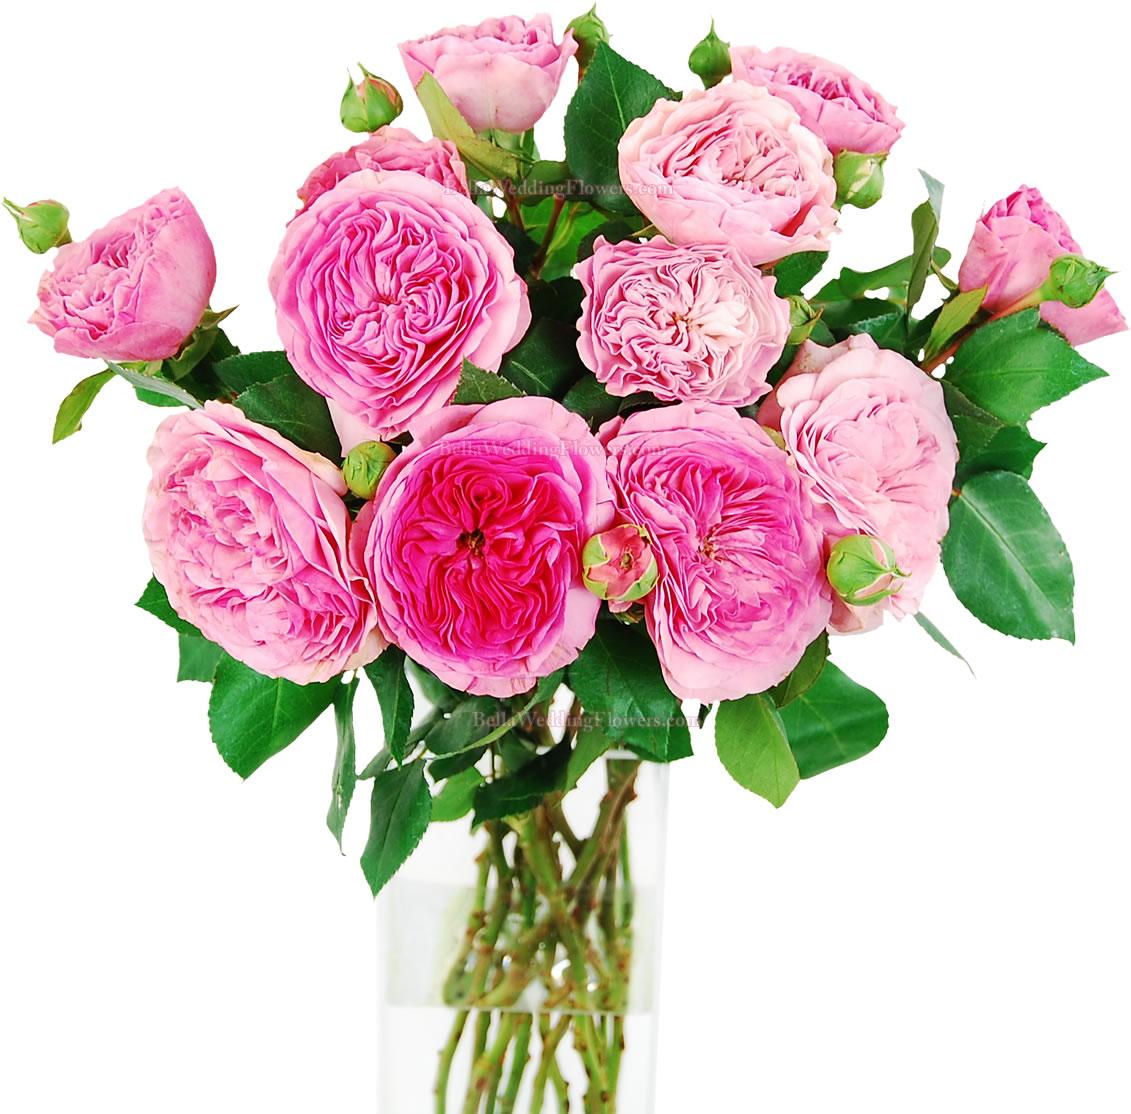 Bringing Back The Garden Rose Vintage Wedding Trend Still